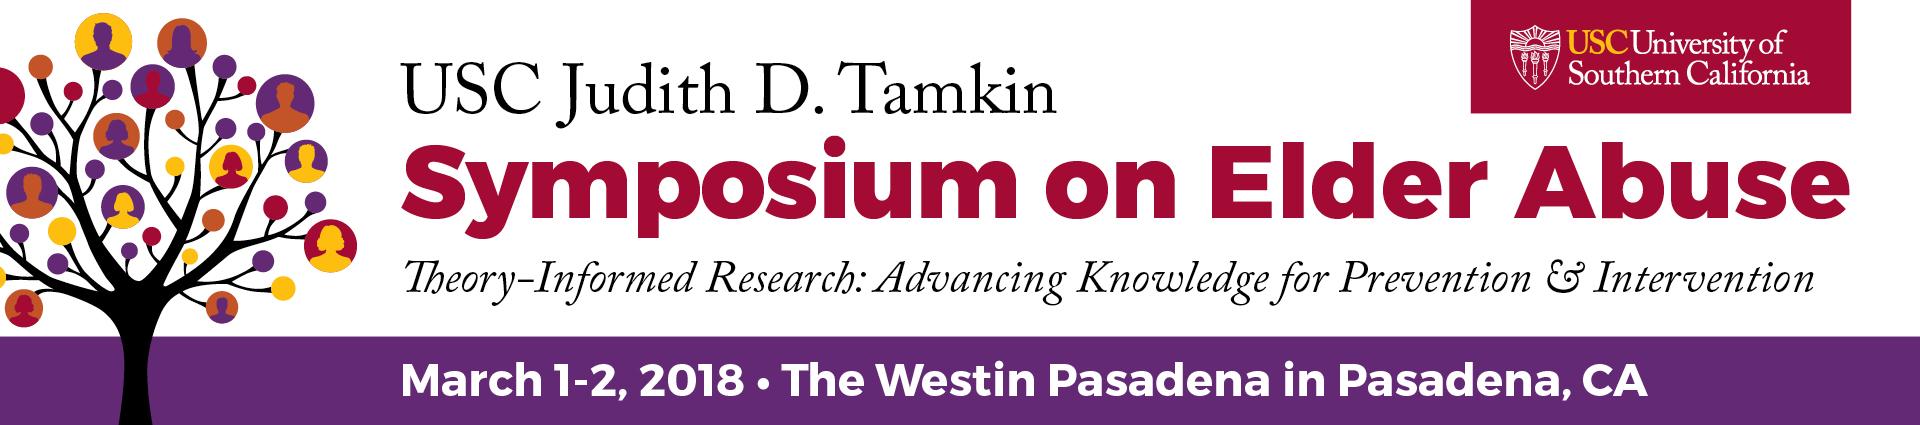 USC Judith D. Tamkin Symposium on Elder Abuse